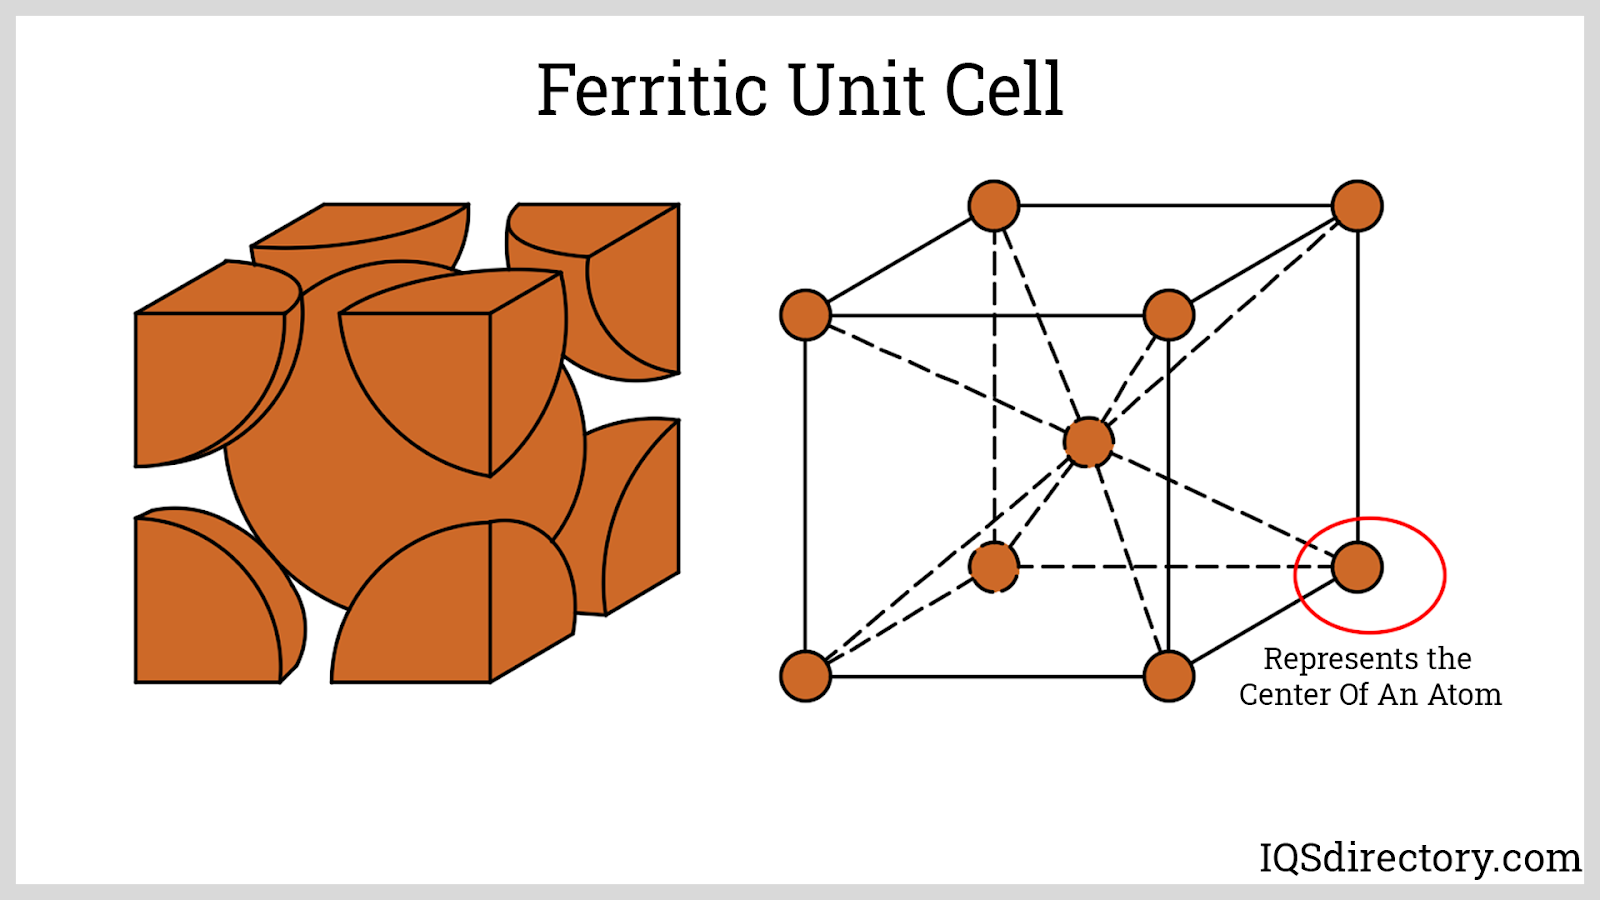 Ferritic Unit Cell